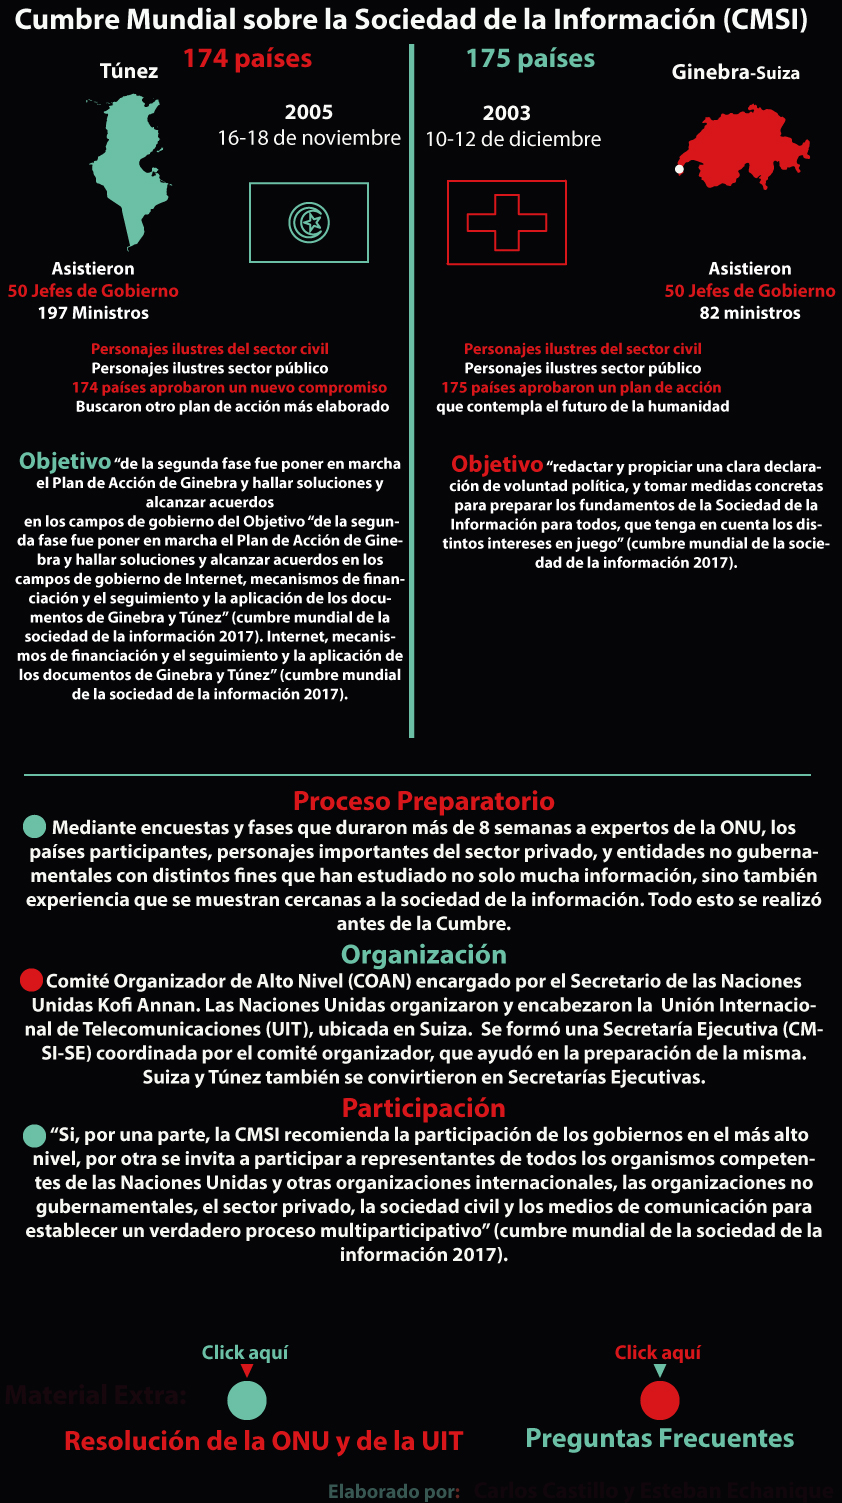 InfografiacuadrocomparativoFinal.jpg